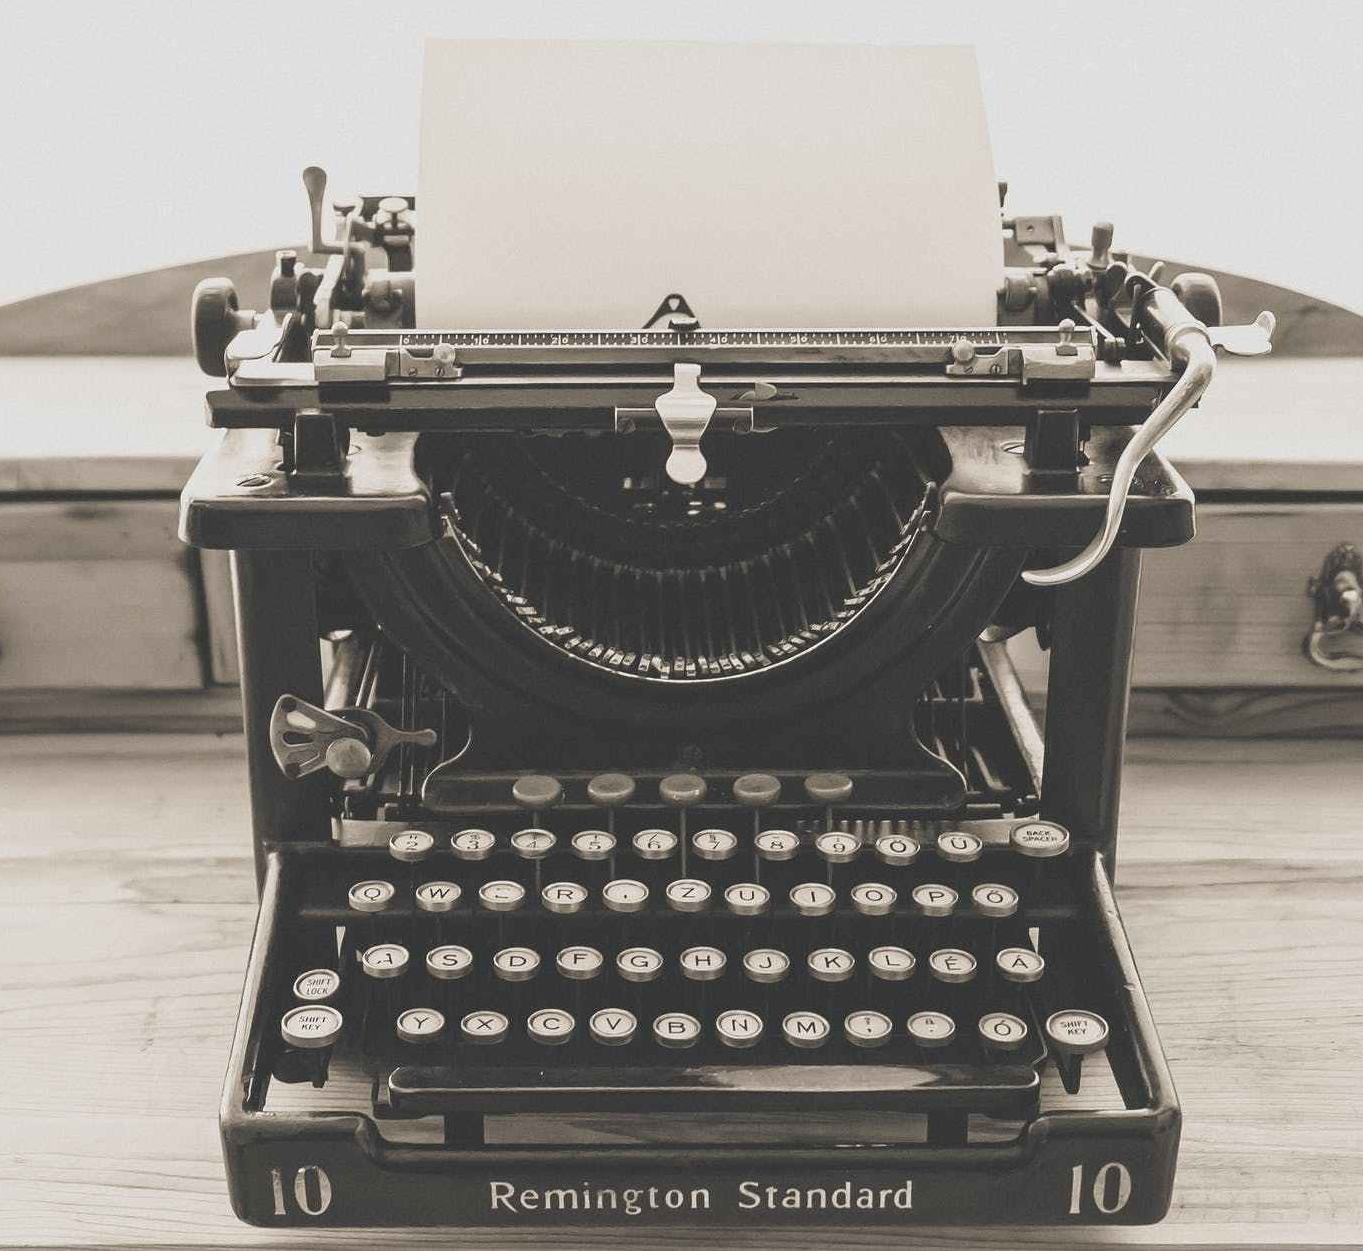 remington standard typewriter in greyscale photography